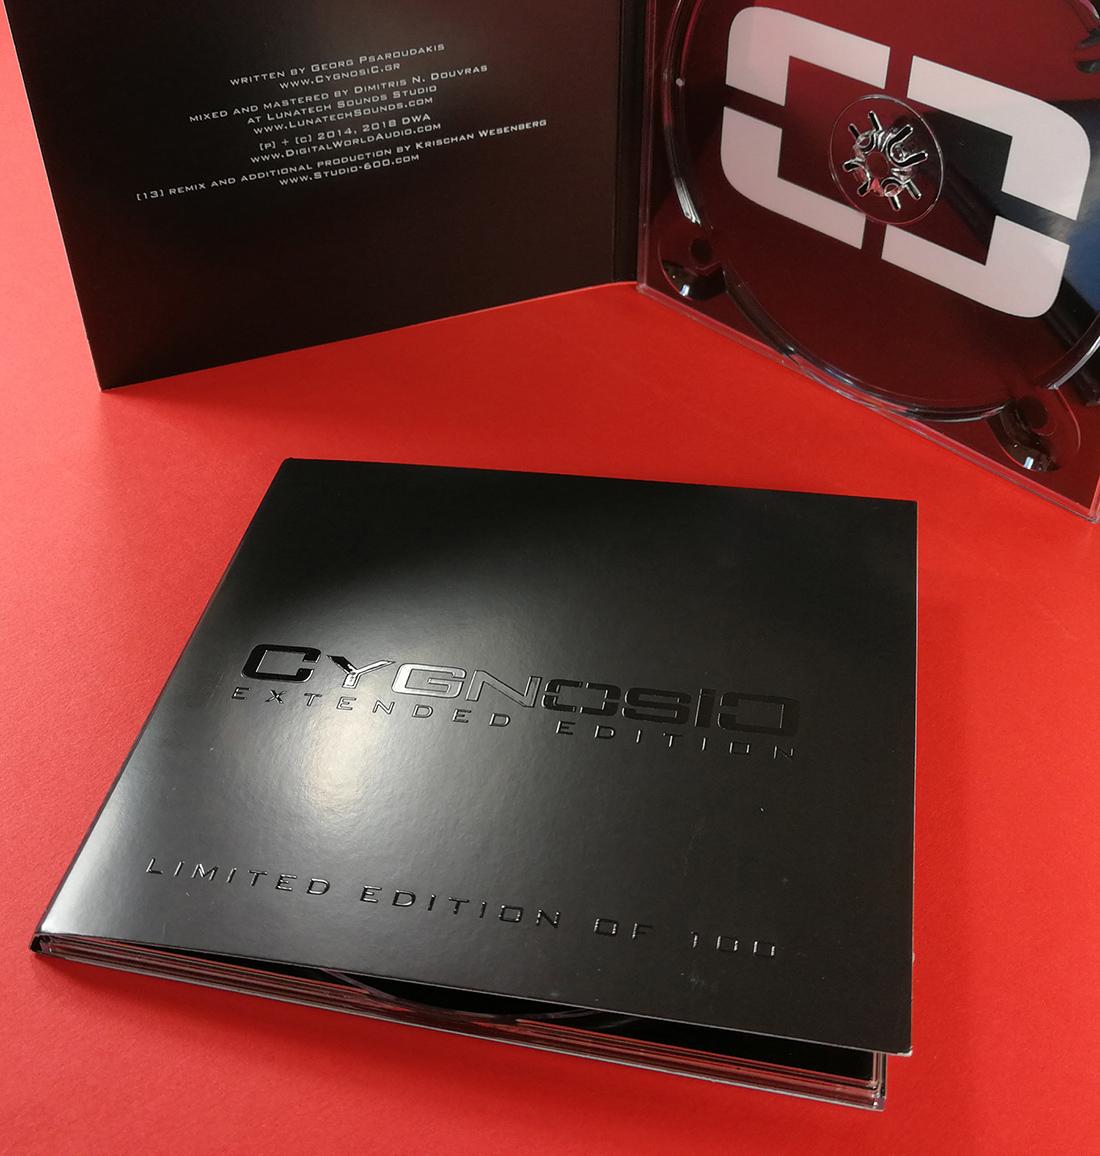 Full colour printed CD digipaks with spot gloss UV LED cover printing